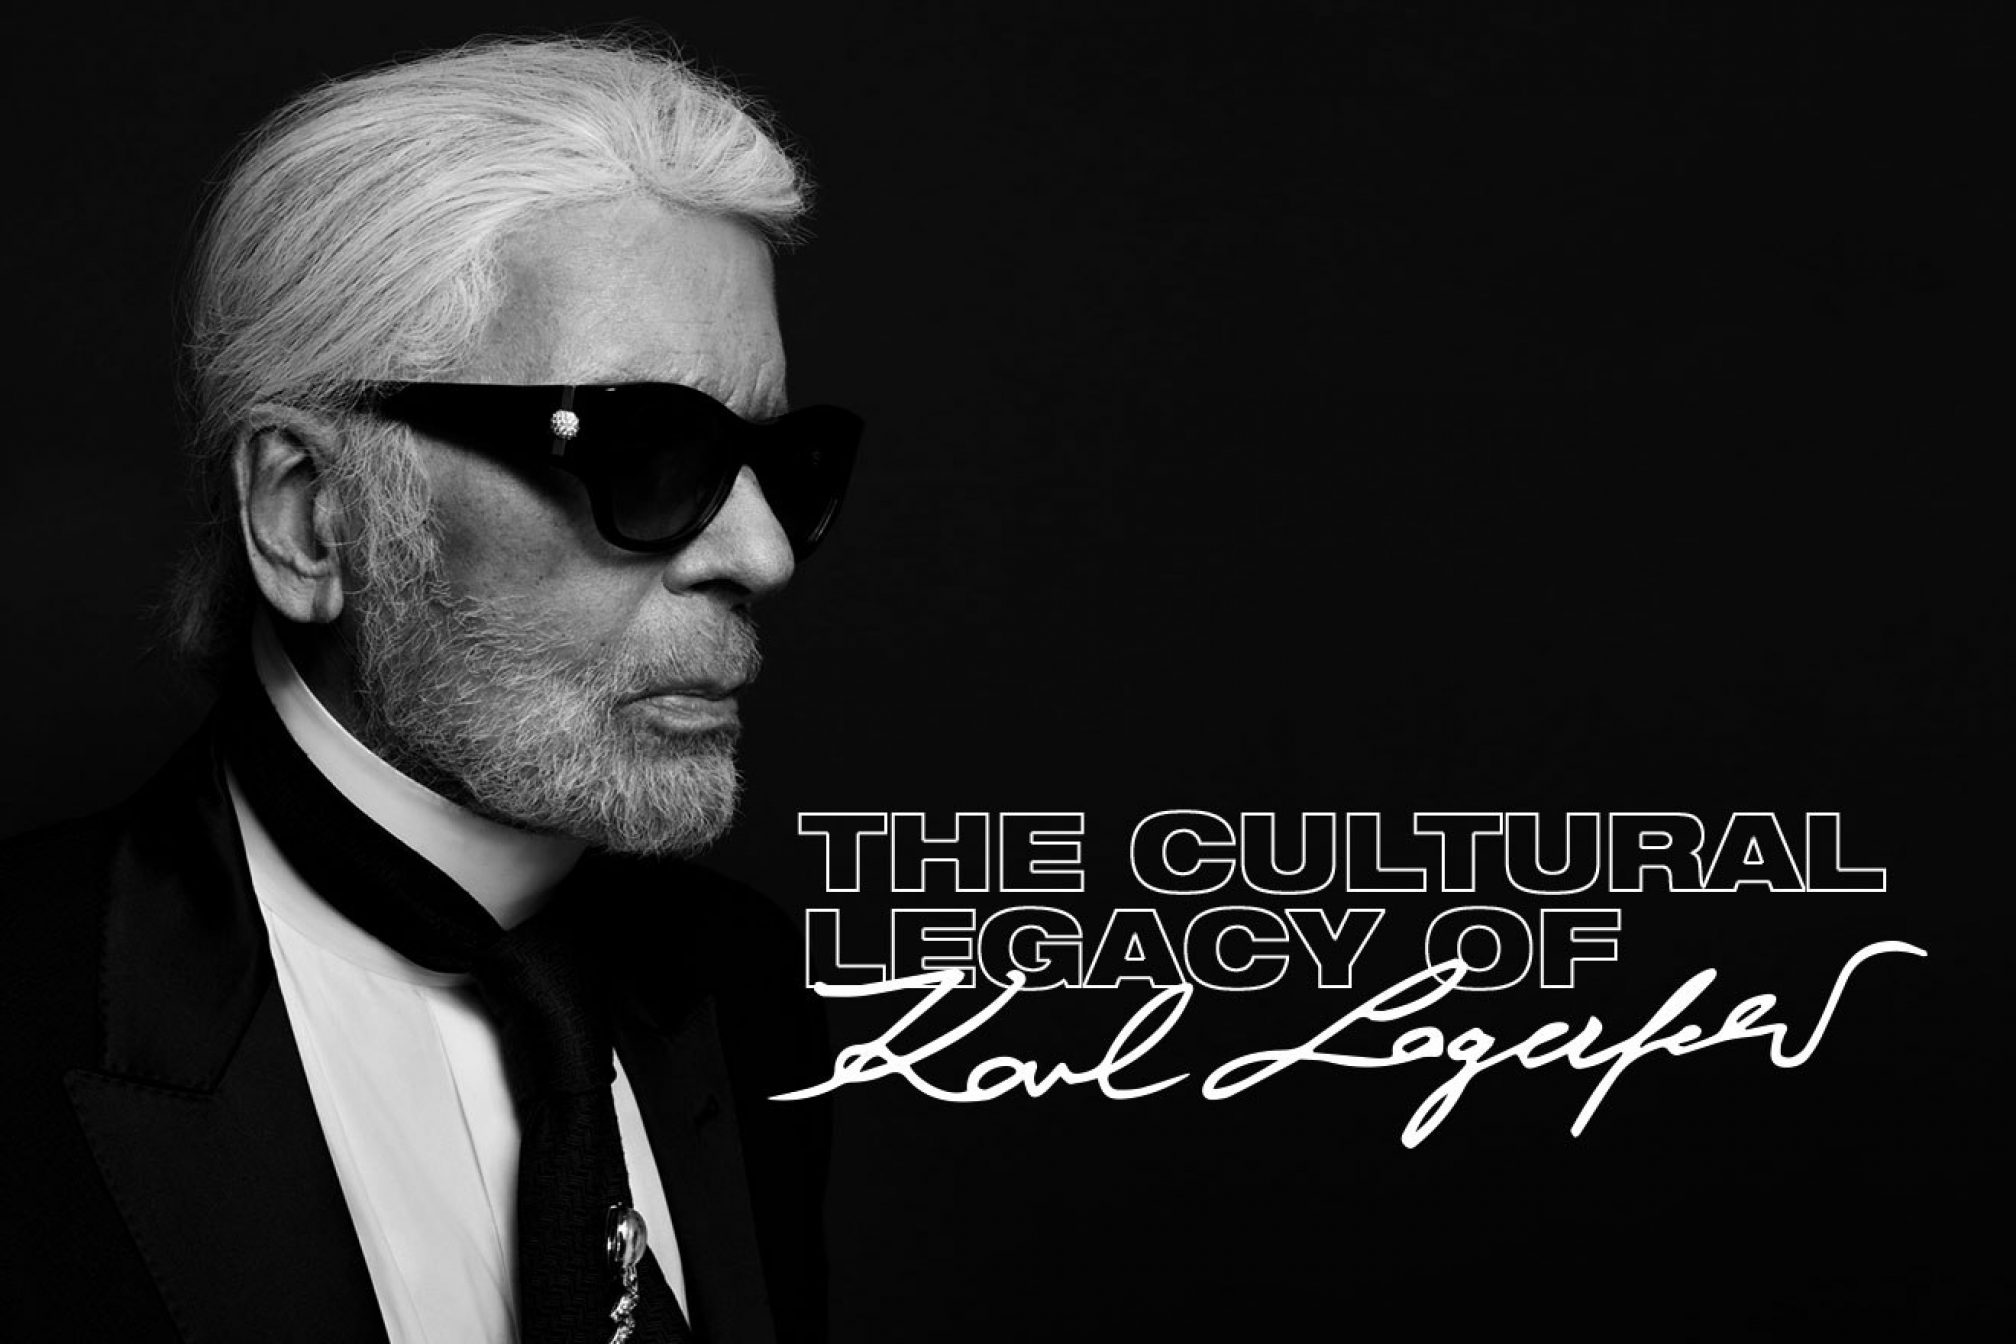 karl-lagerfeld-obituary